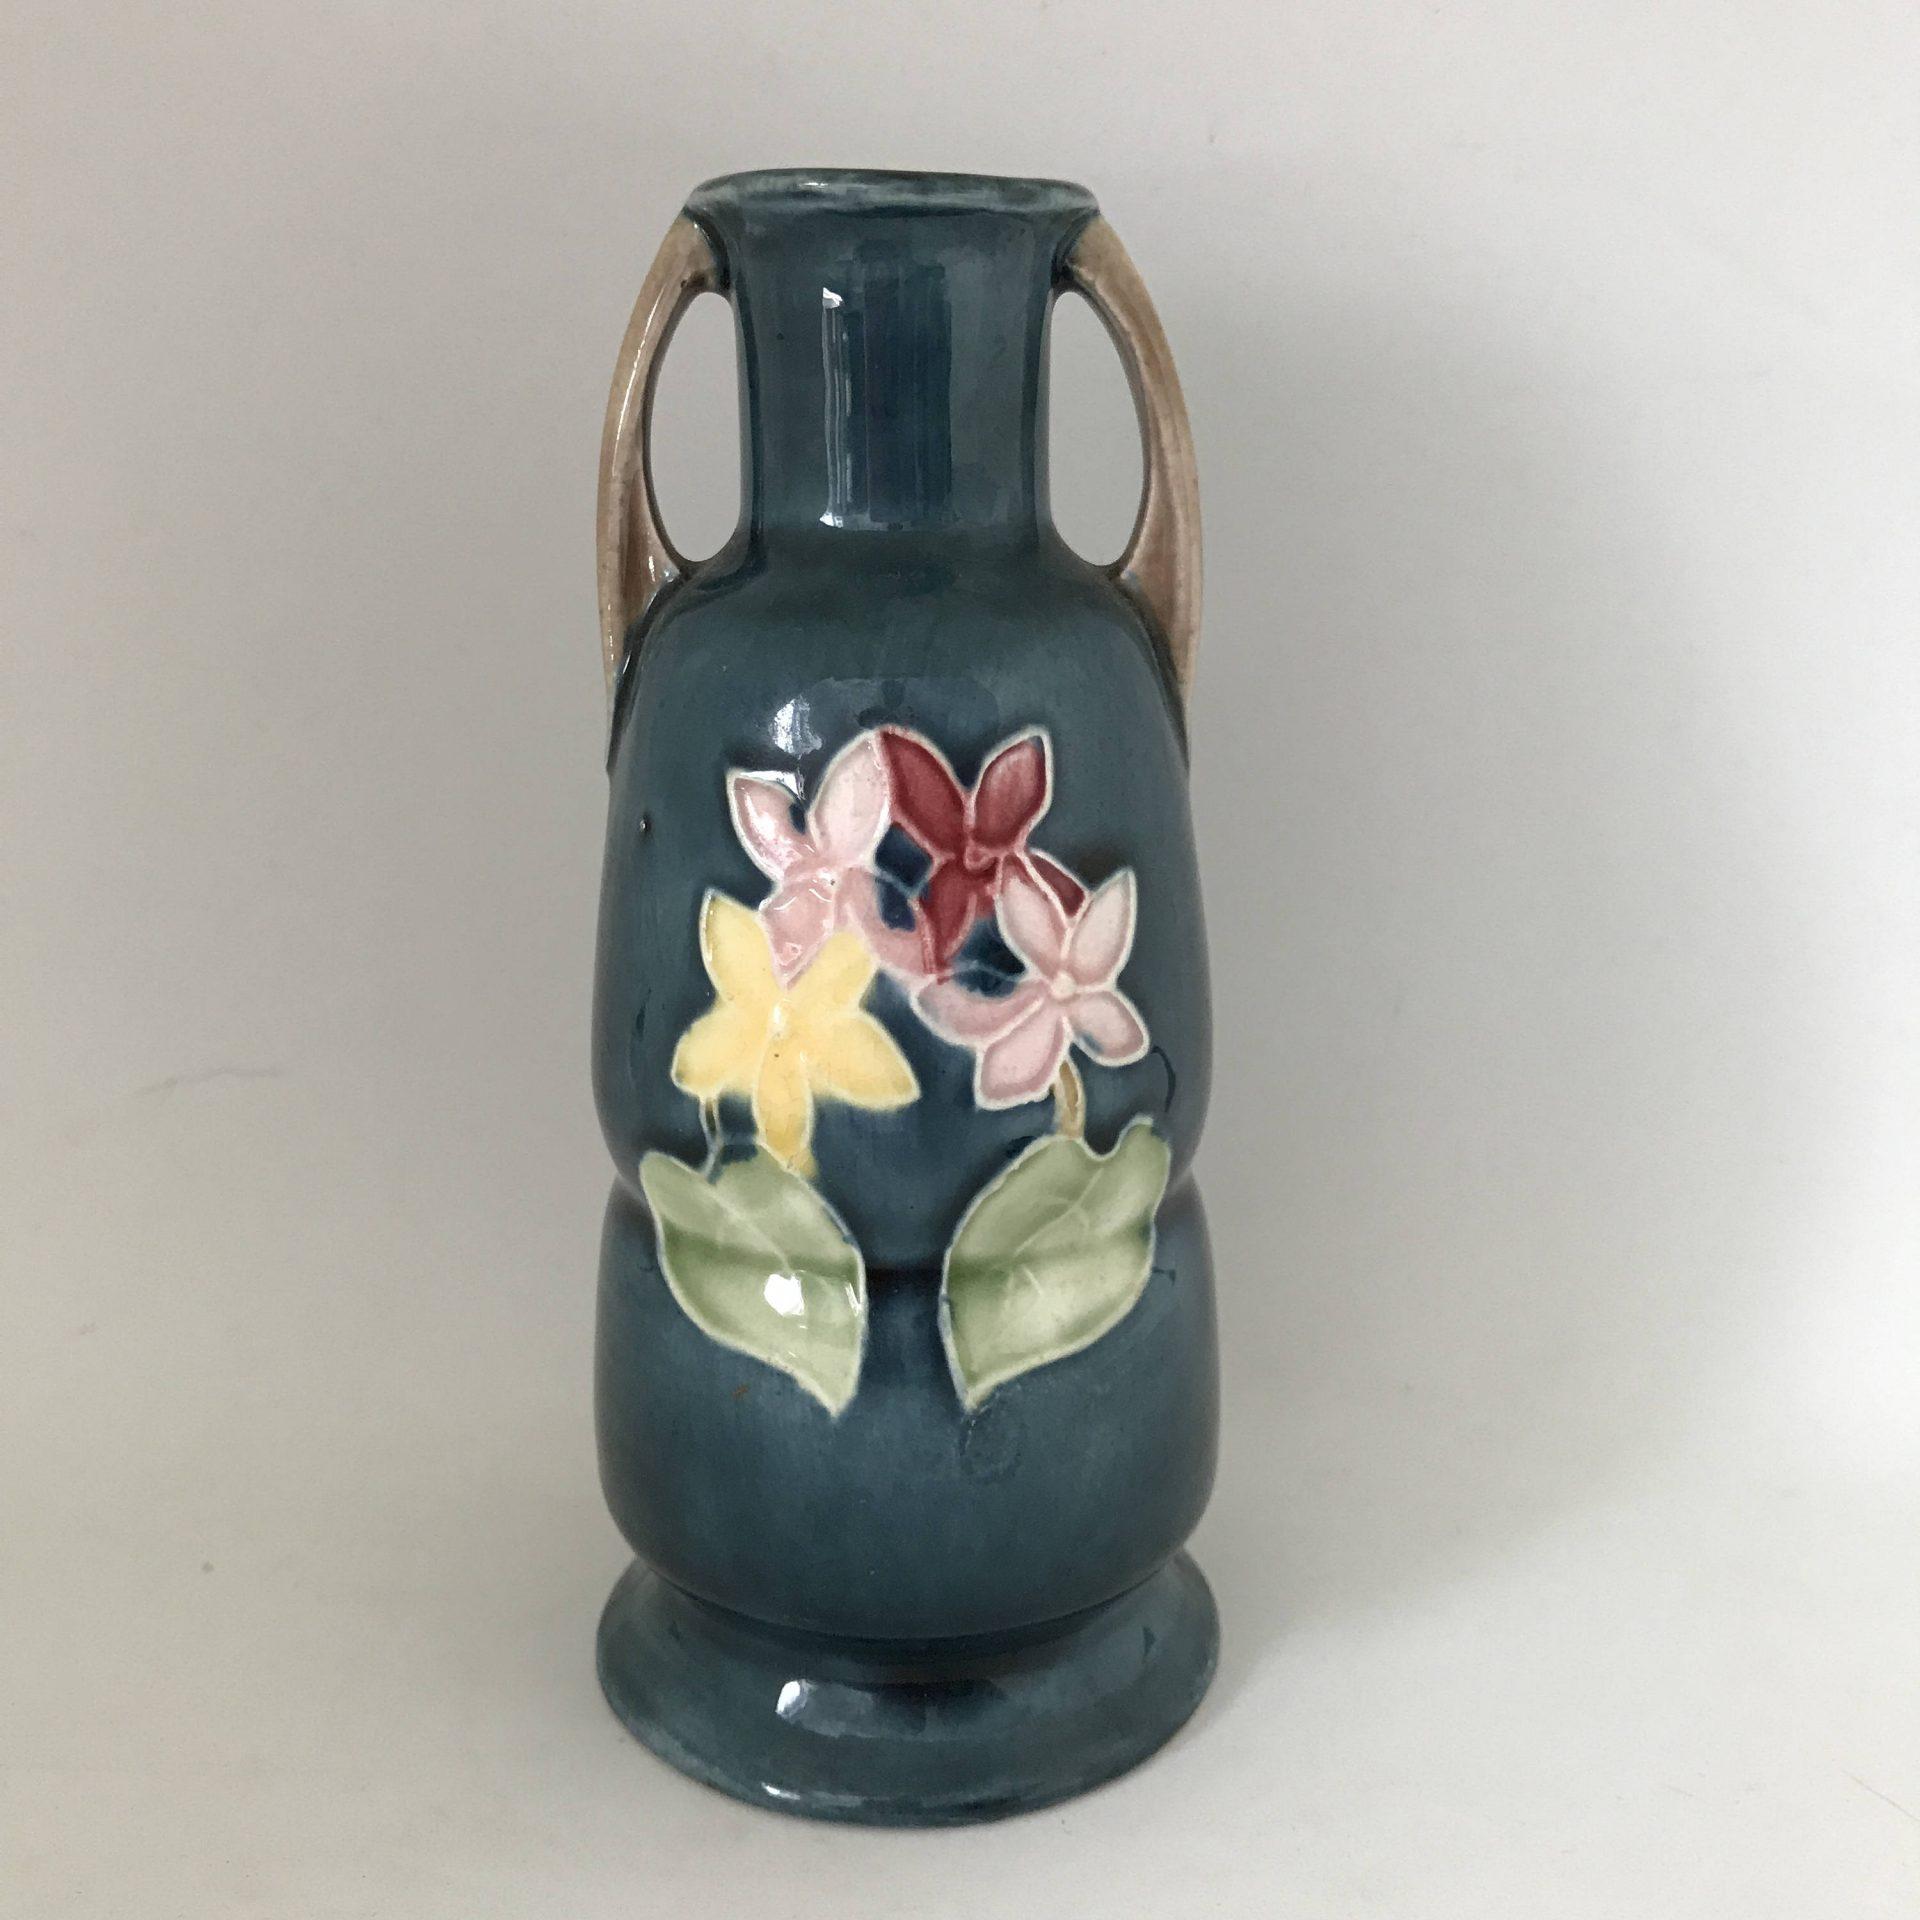 Beautiful Antique double handled pottery vase Ampora Vase Hand painted detailed raised edge flowers